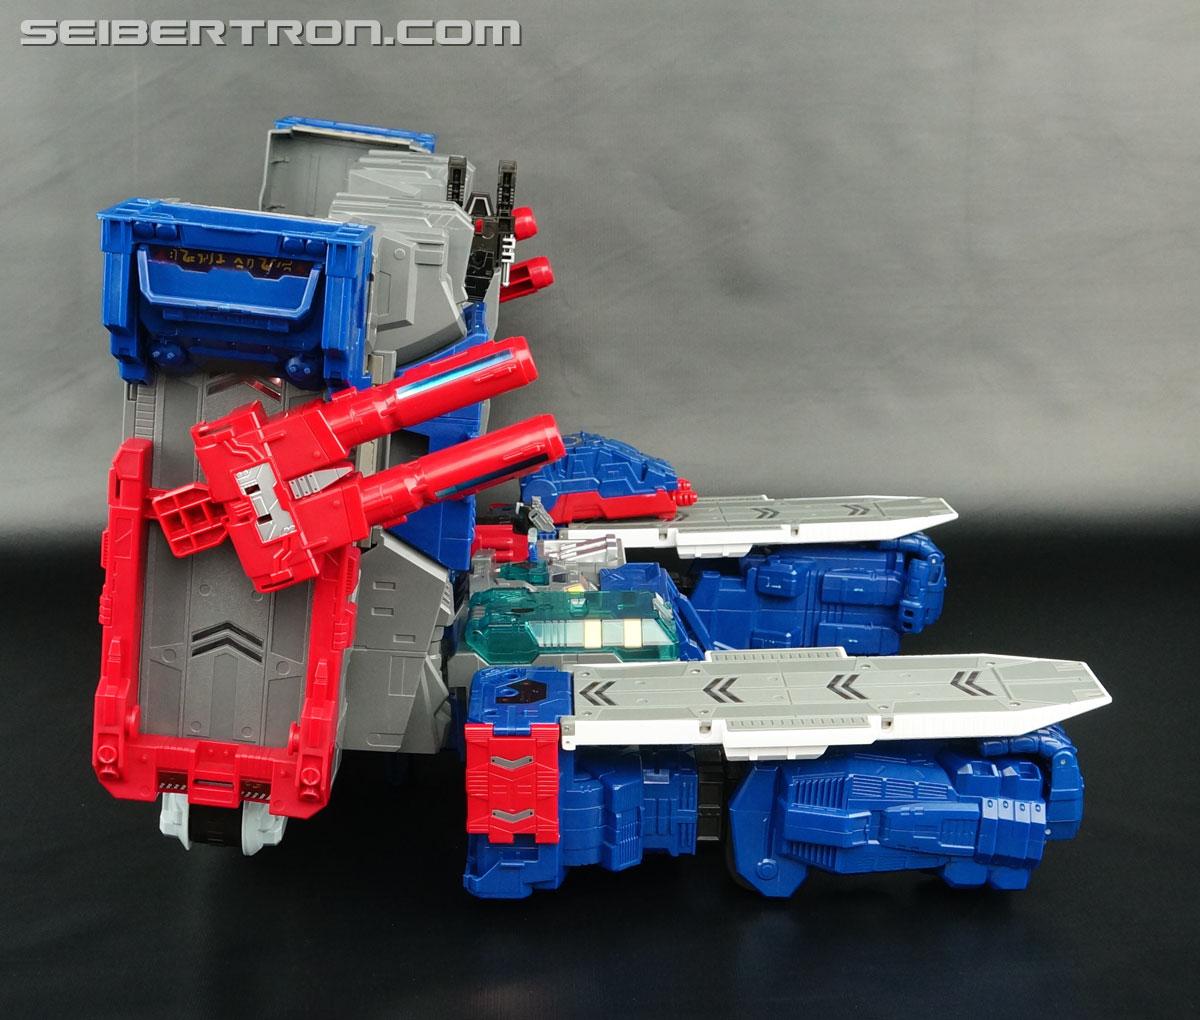 Transformers Titans Return Fortress Maximus (Image #164 of 399)